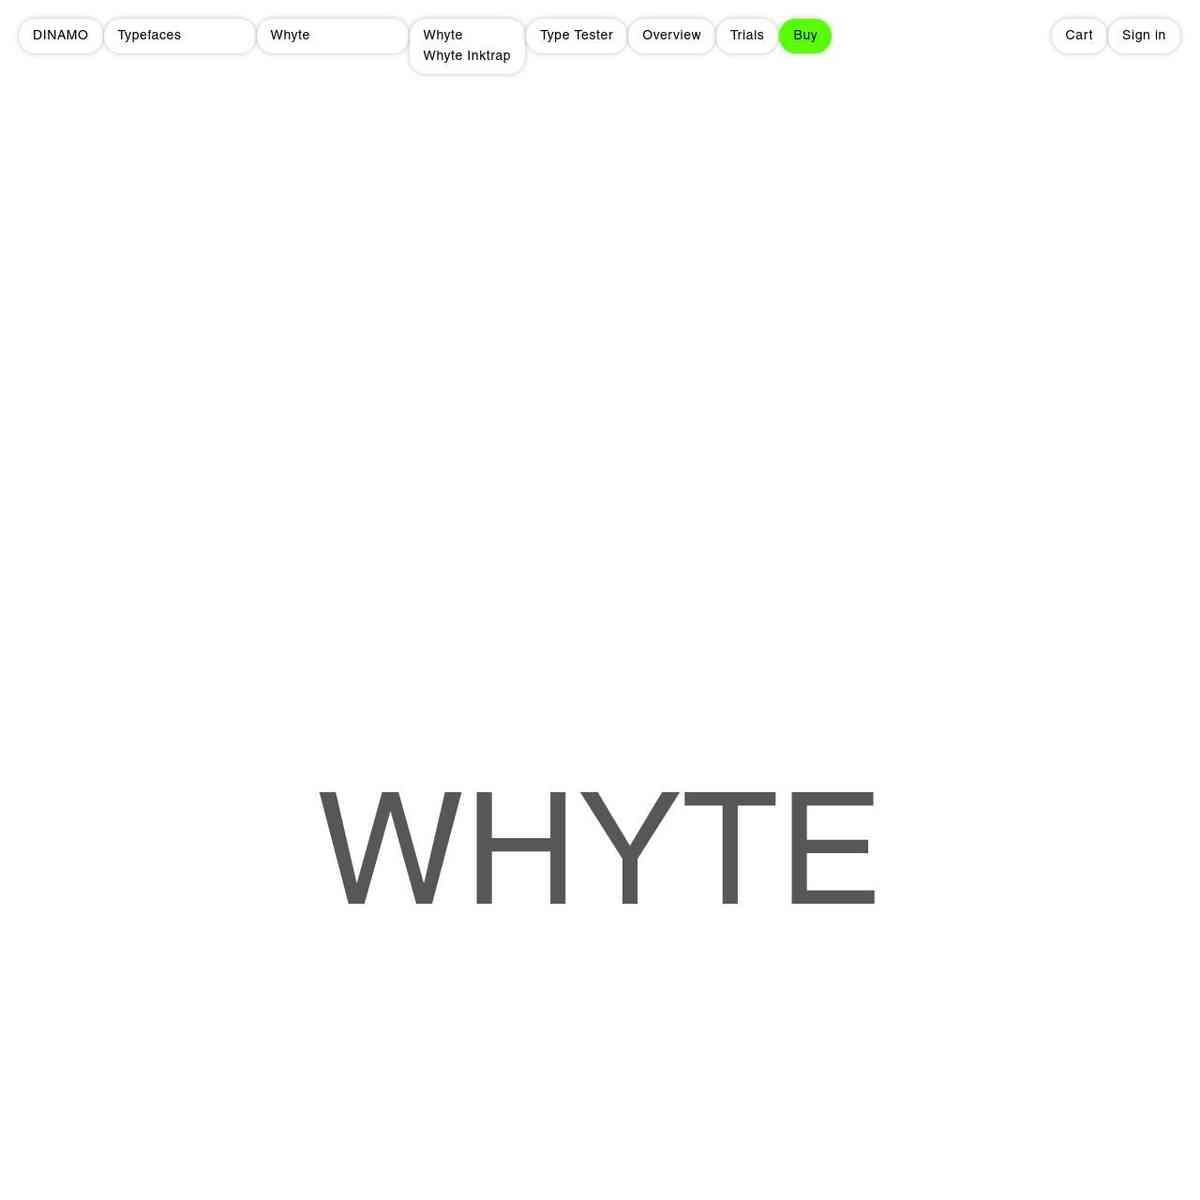 DINAMO: Typefaces: Whyte